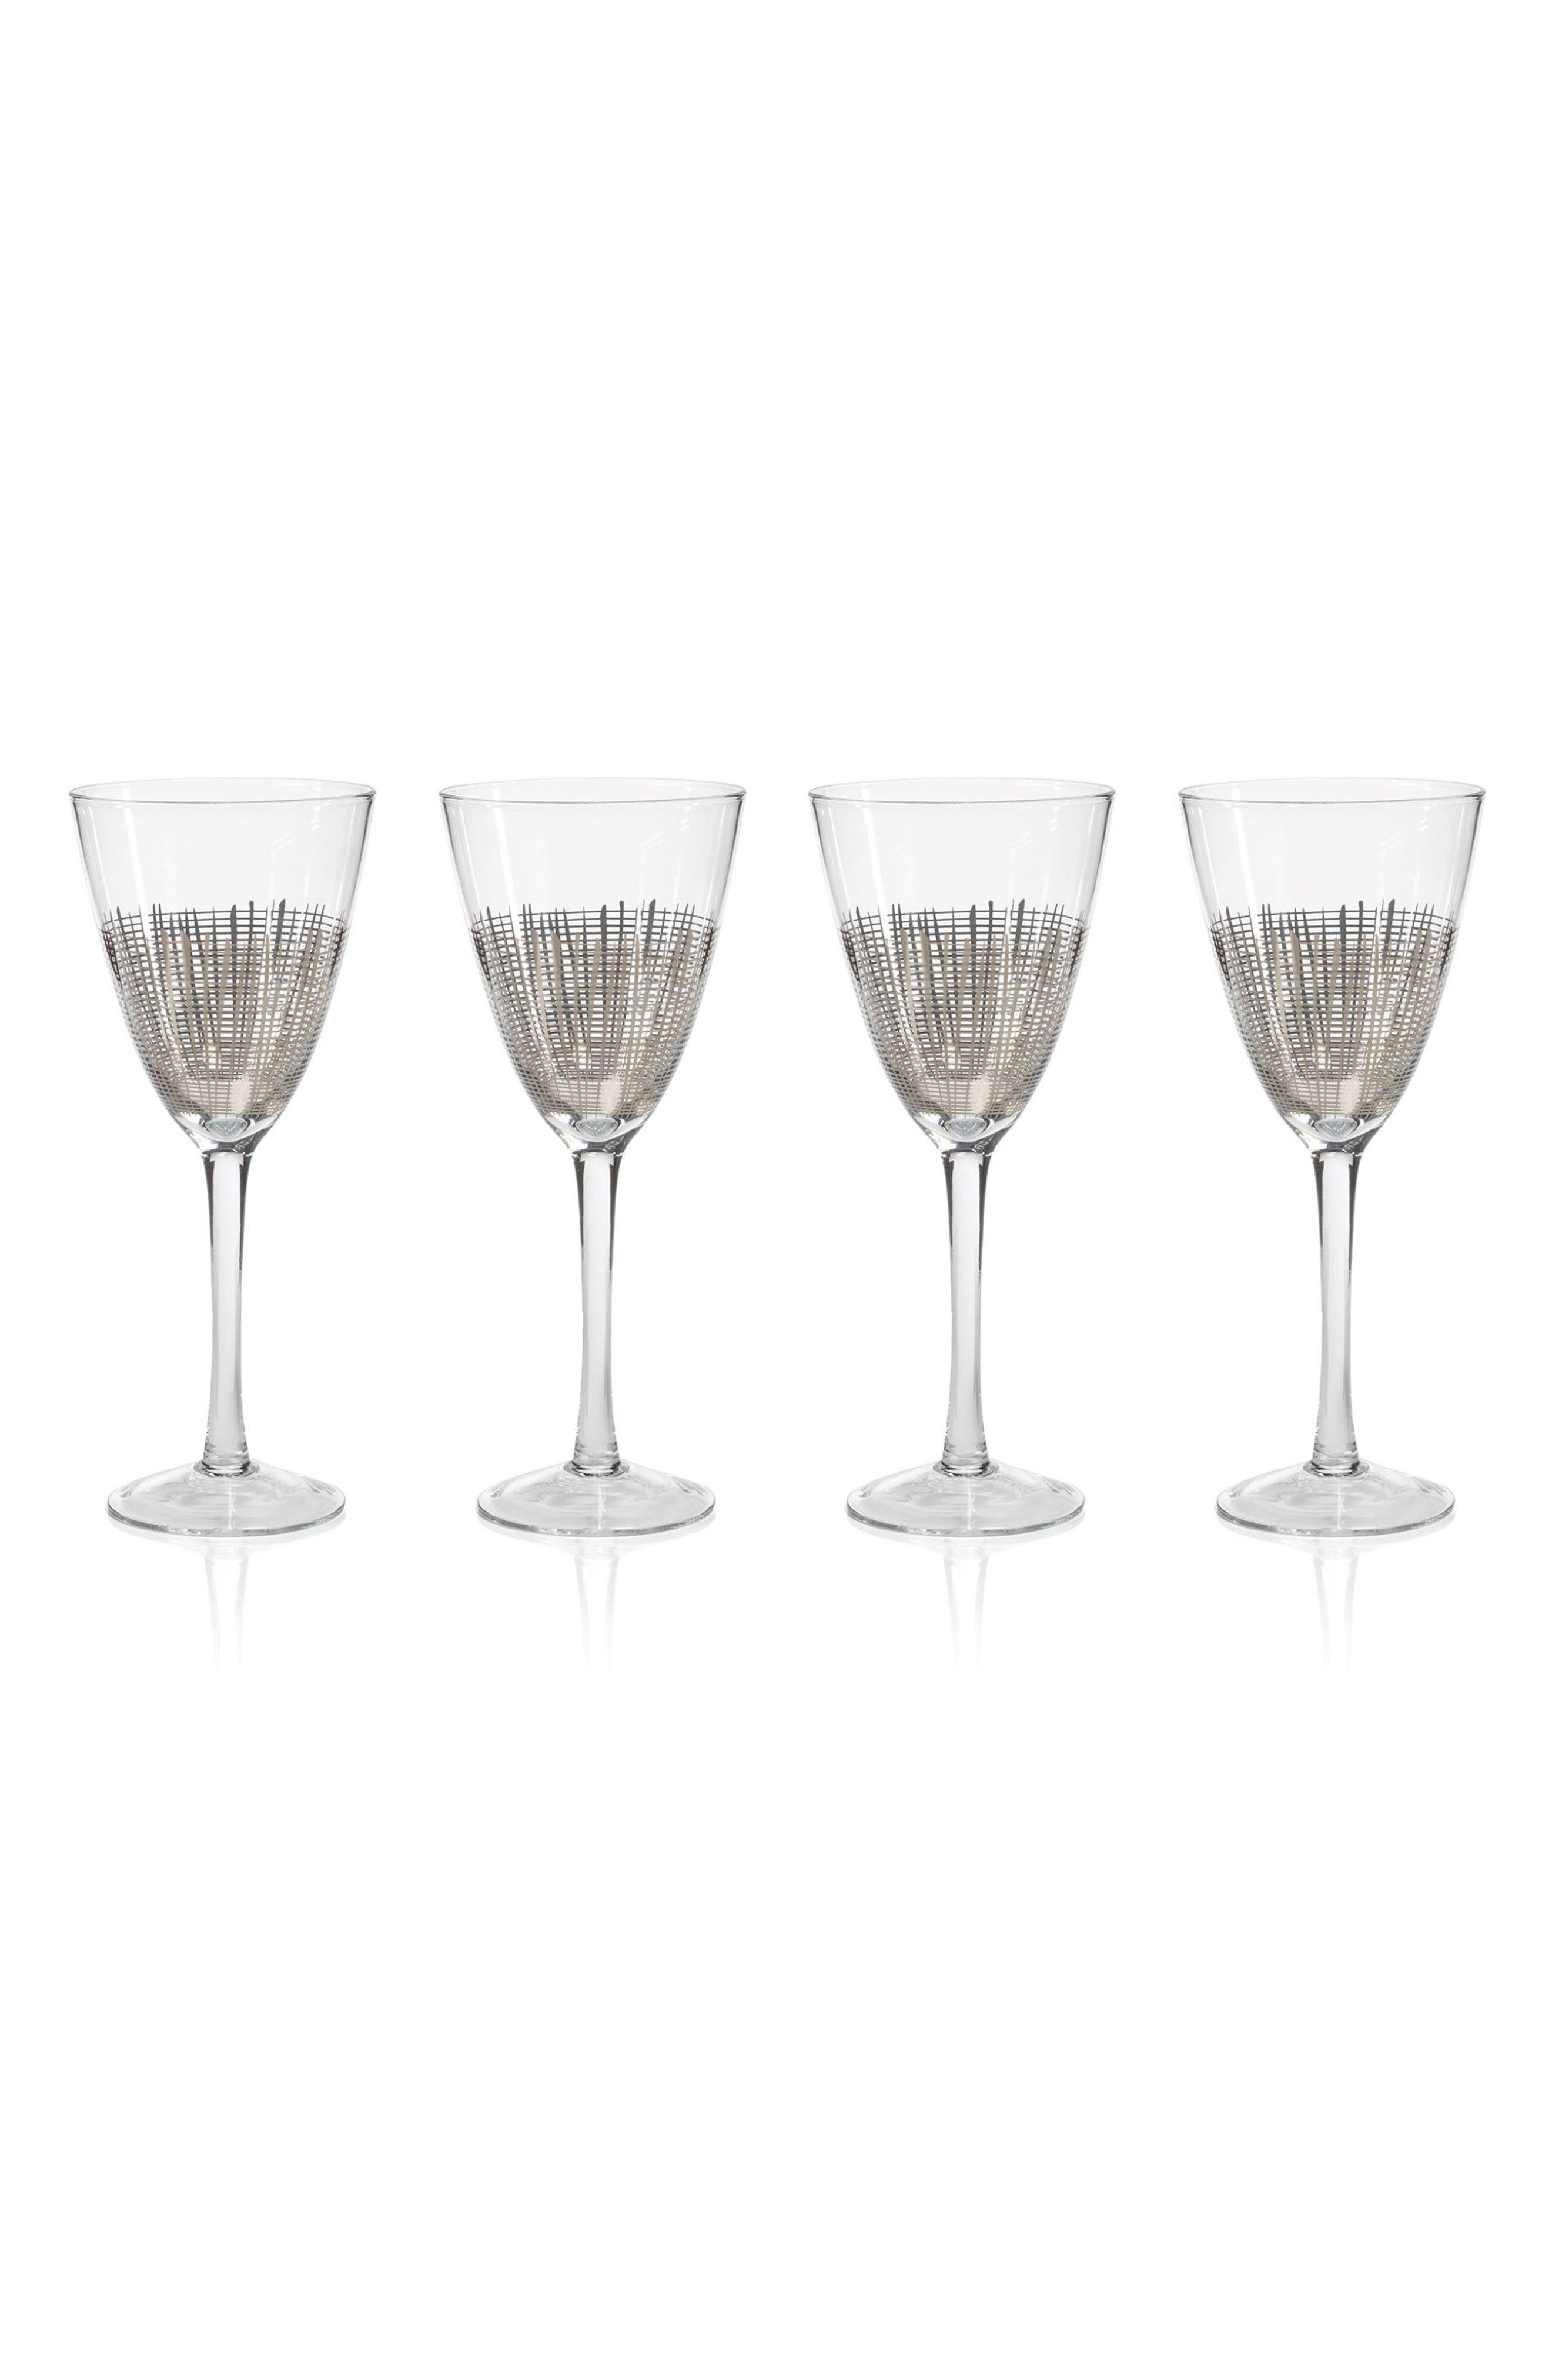 Reza Set of 4 Wine Glasses,                         Main,                         color, 040